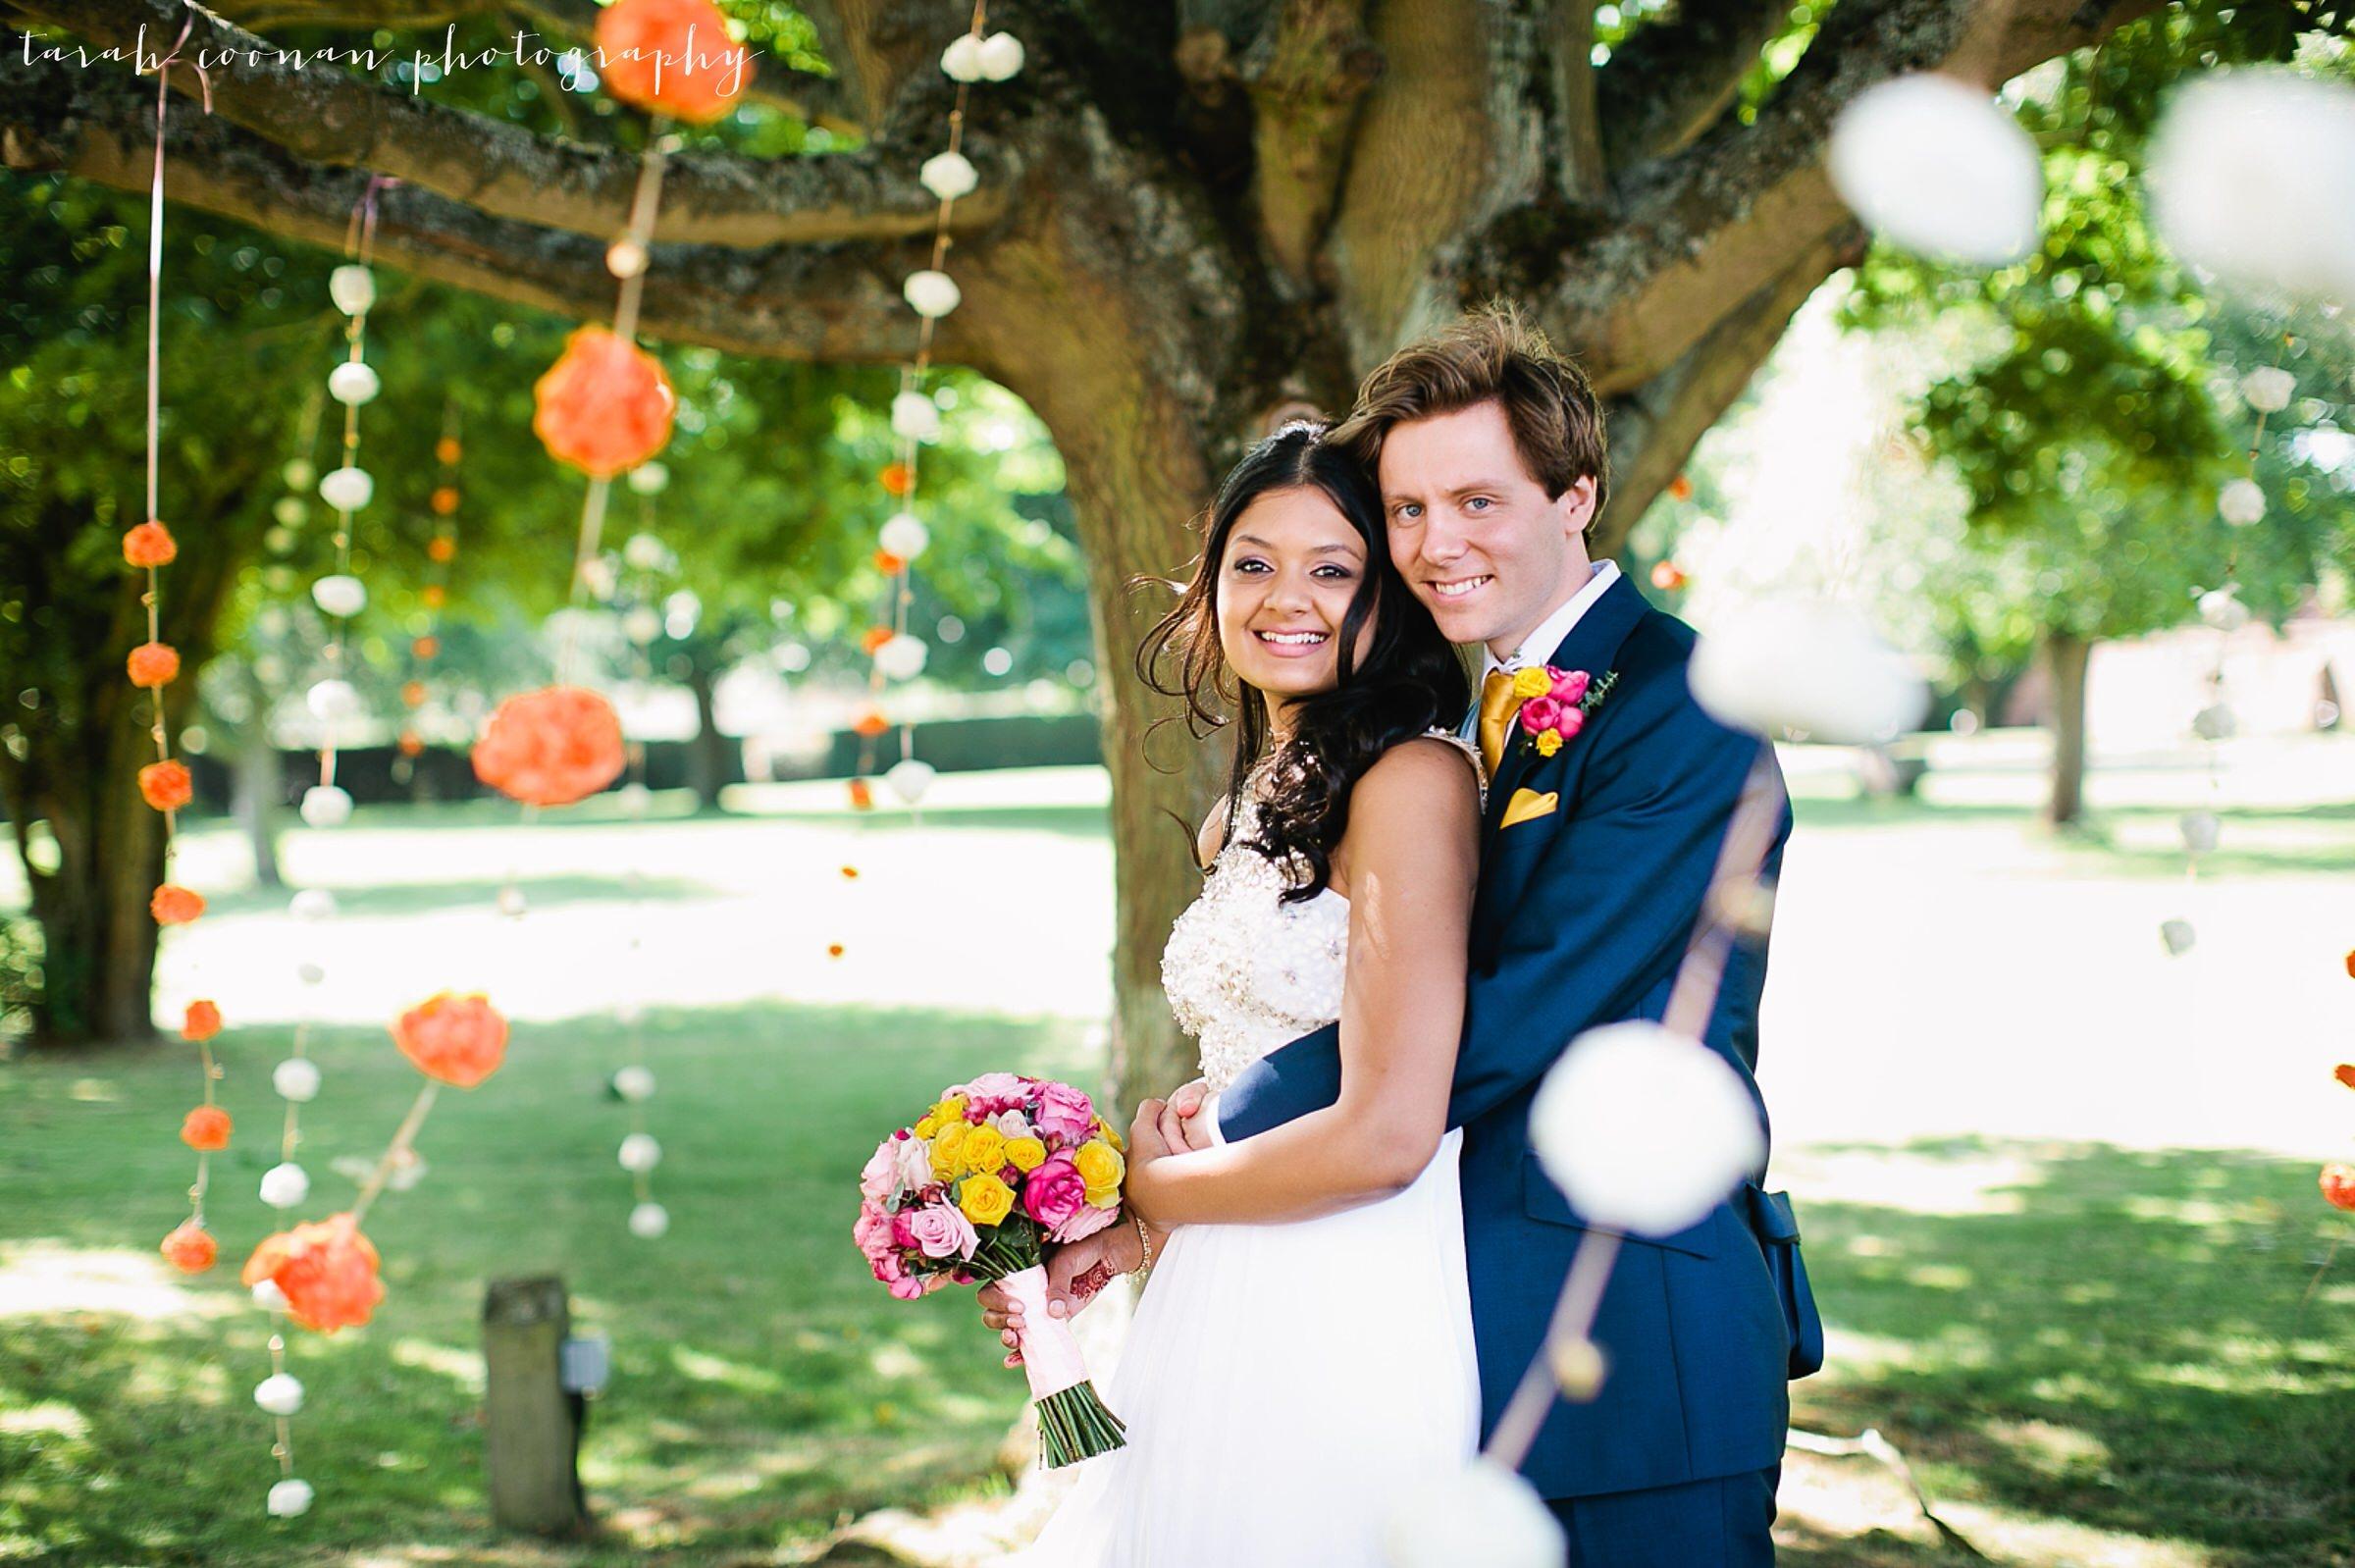 Offley Place Hotel wedding - Sonal & Julian